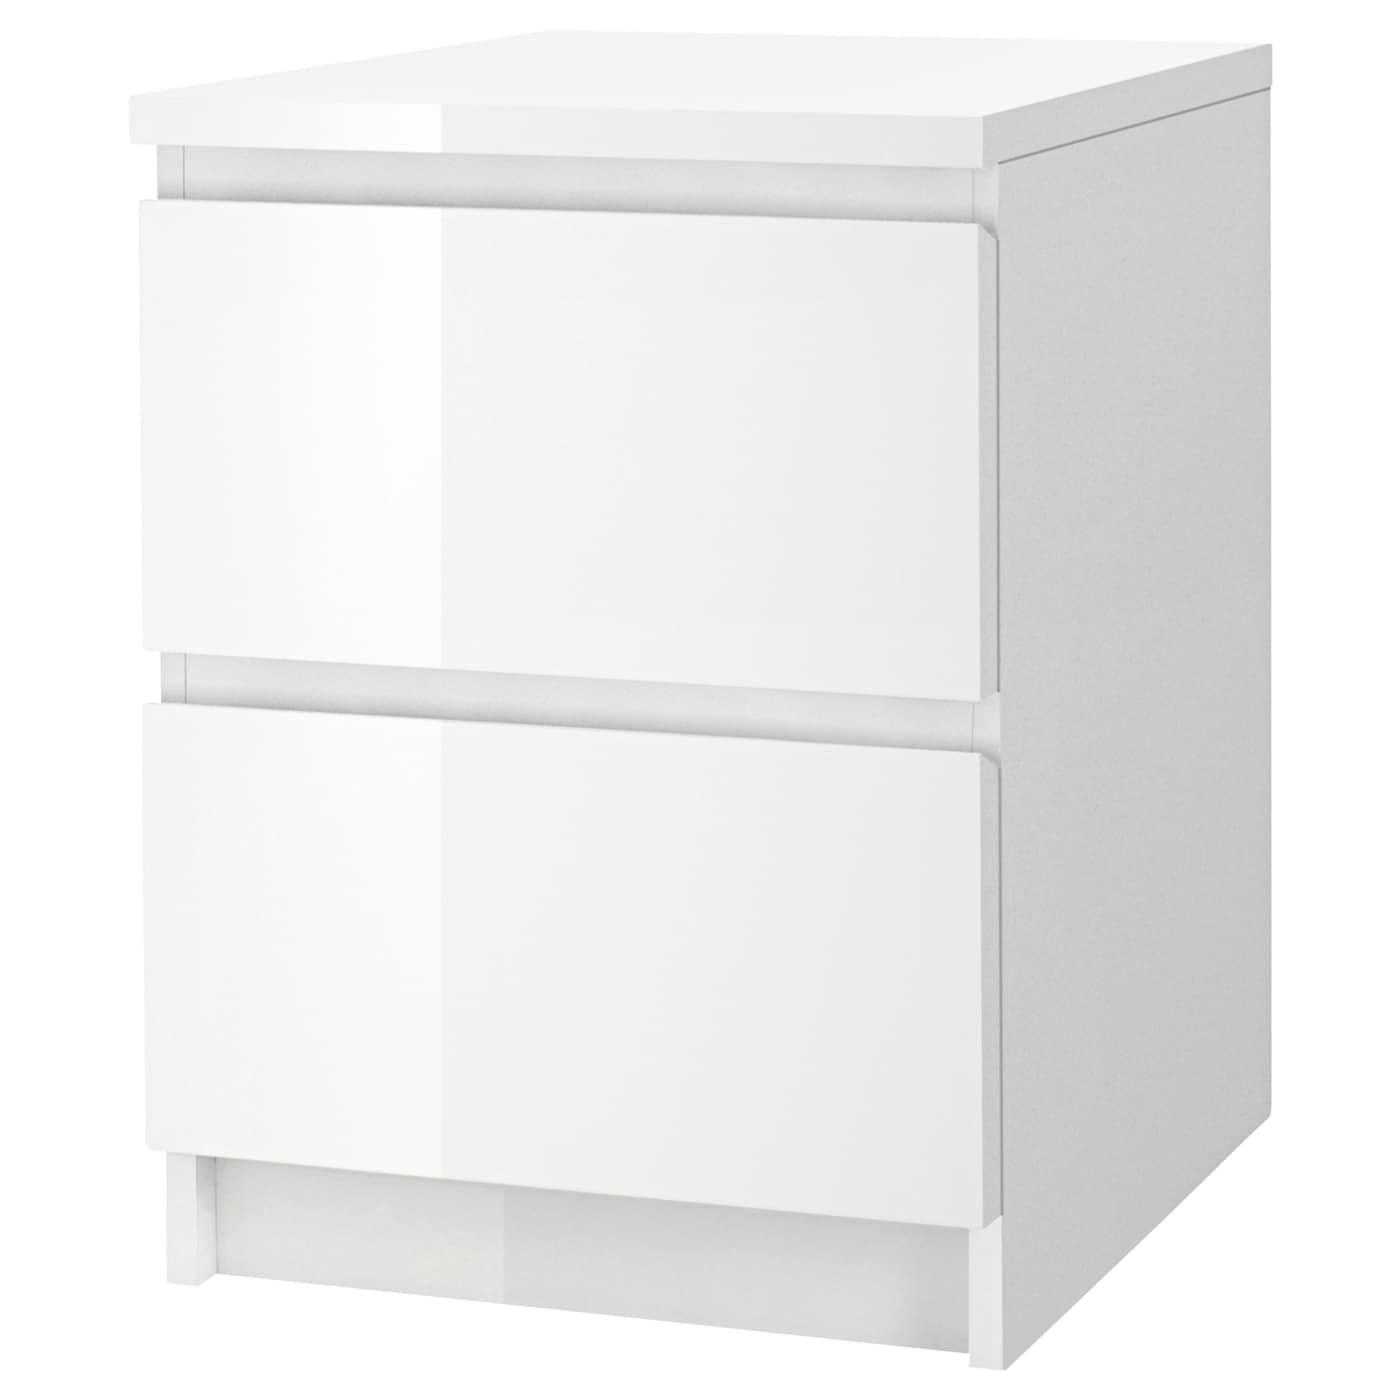 IKEA - MALM Ladekast 2 lades - 40x55 cm - Hoogglans wit